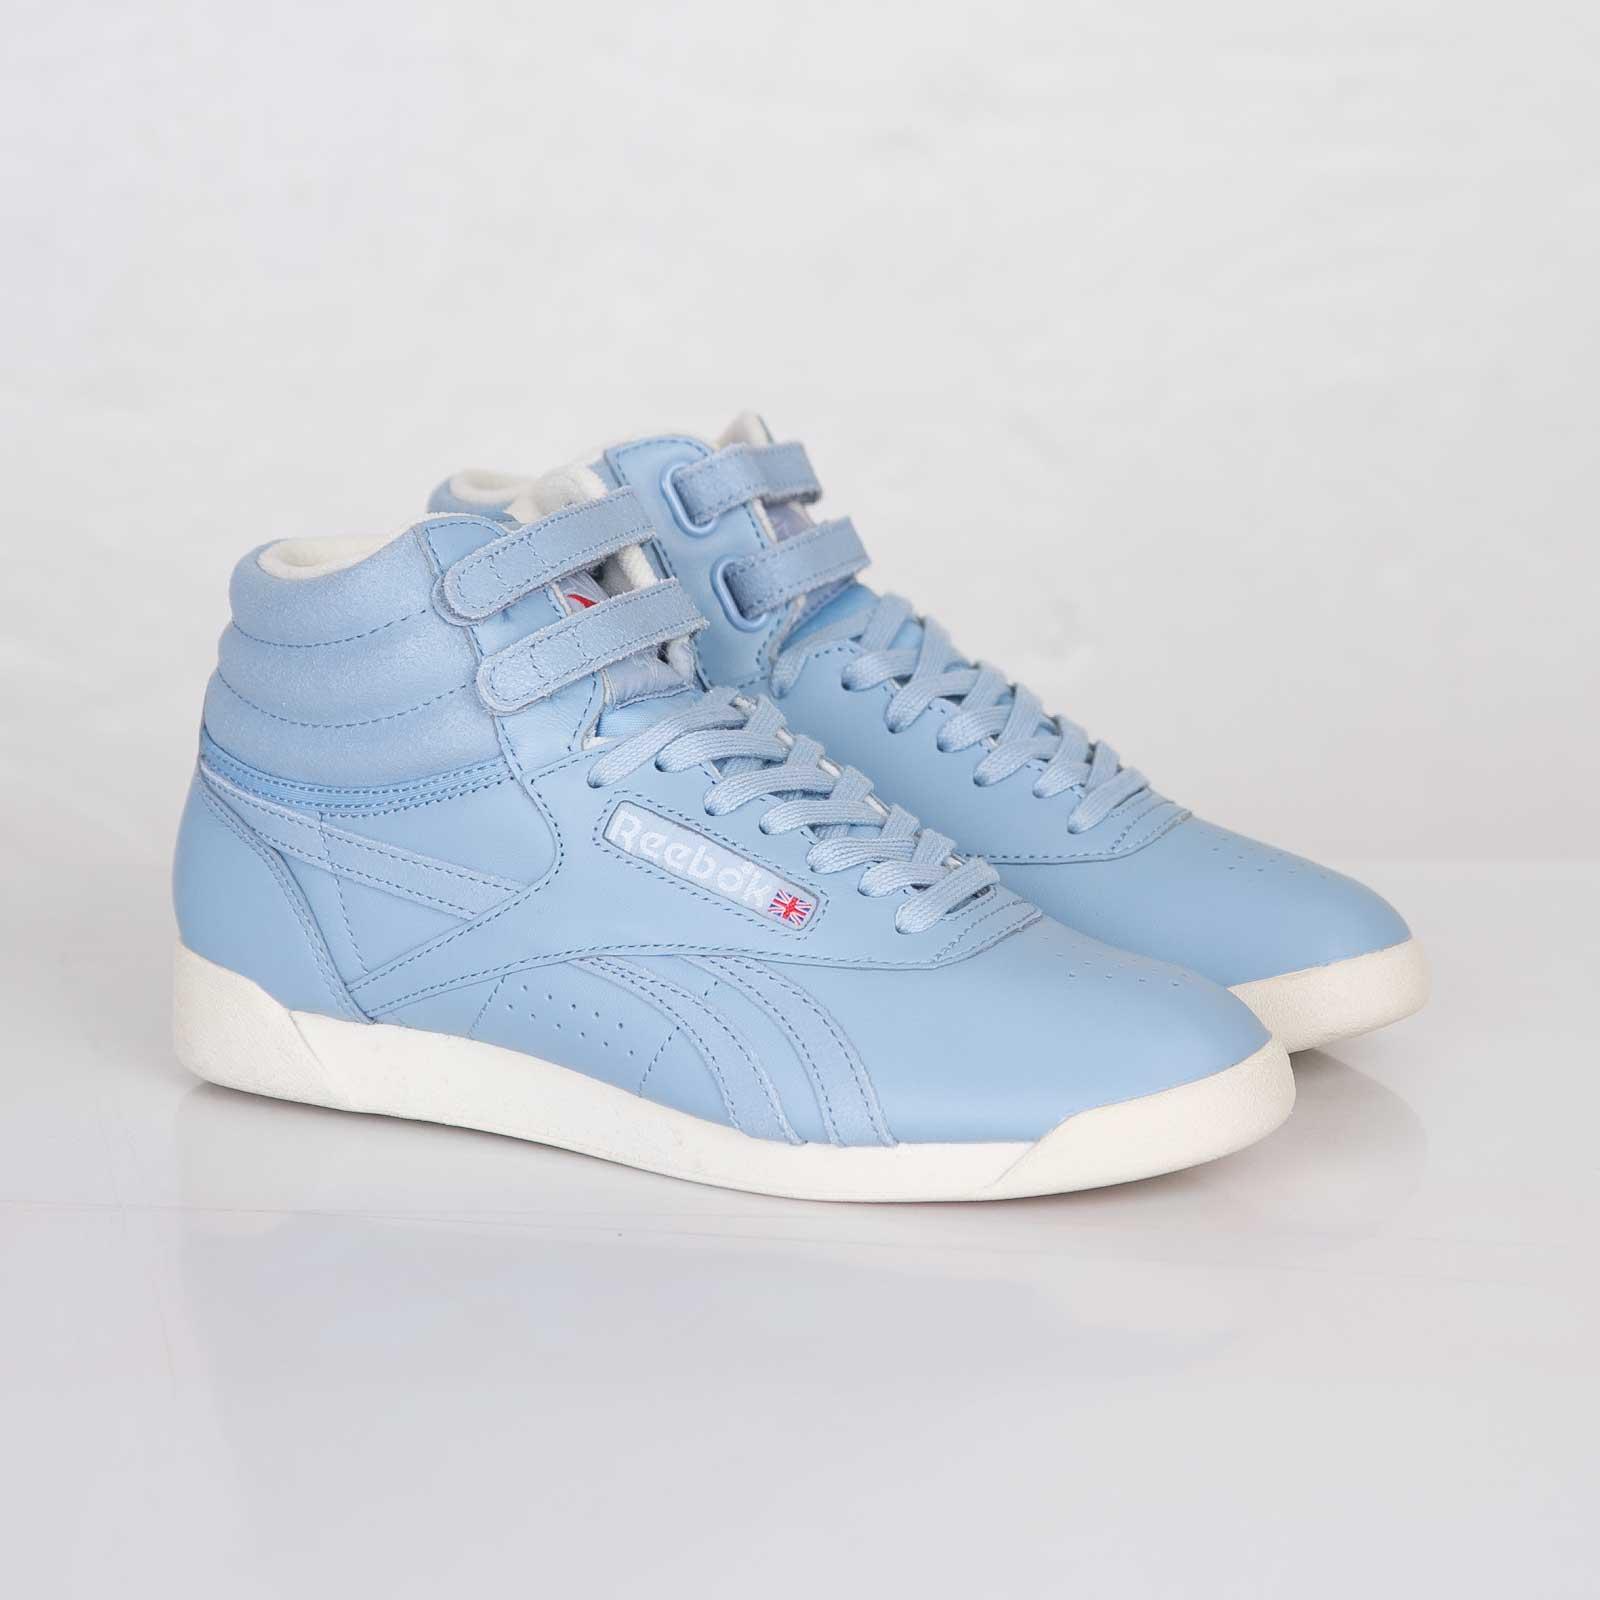 490061dbb61 Reebok Freestyle Hi Spirit - V60551 - Sneakersnstuff